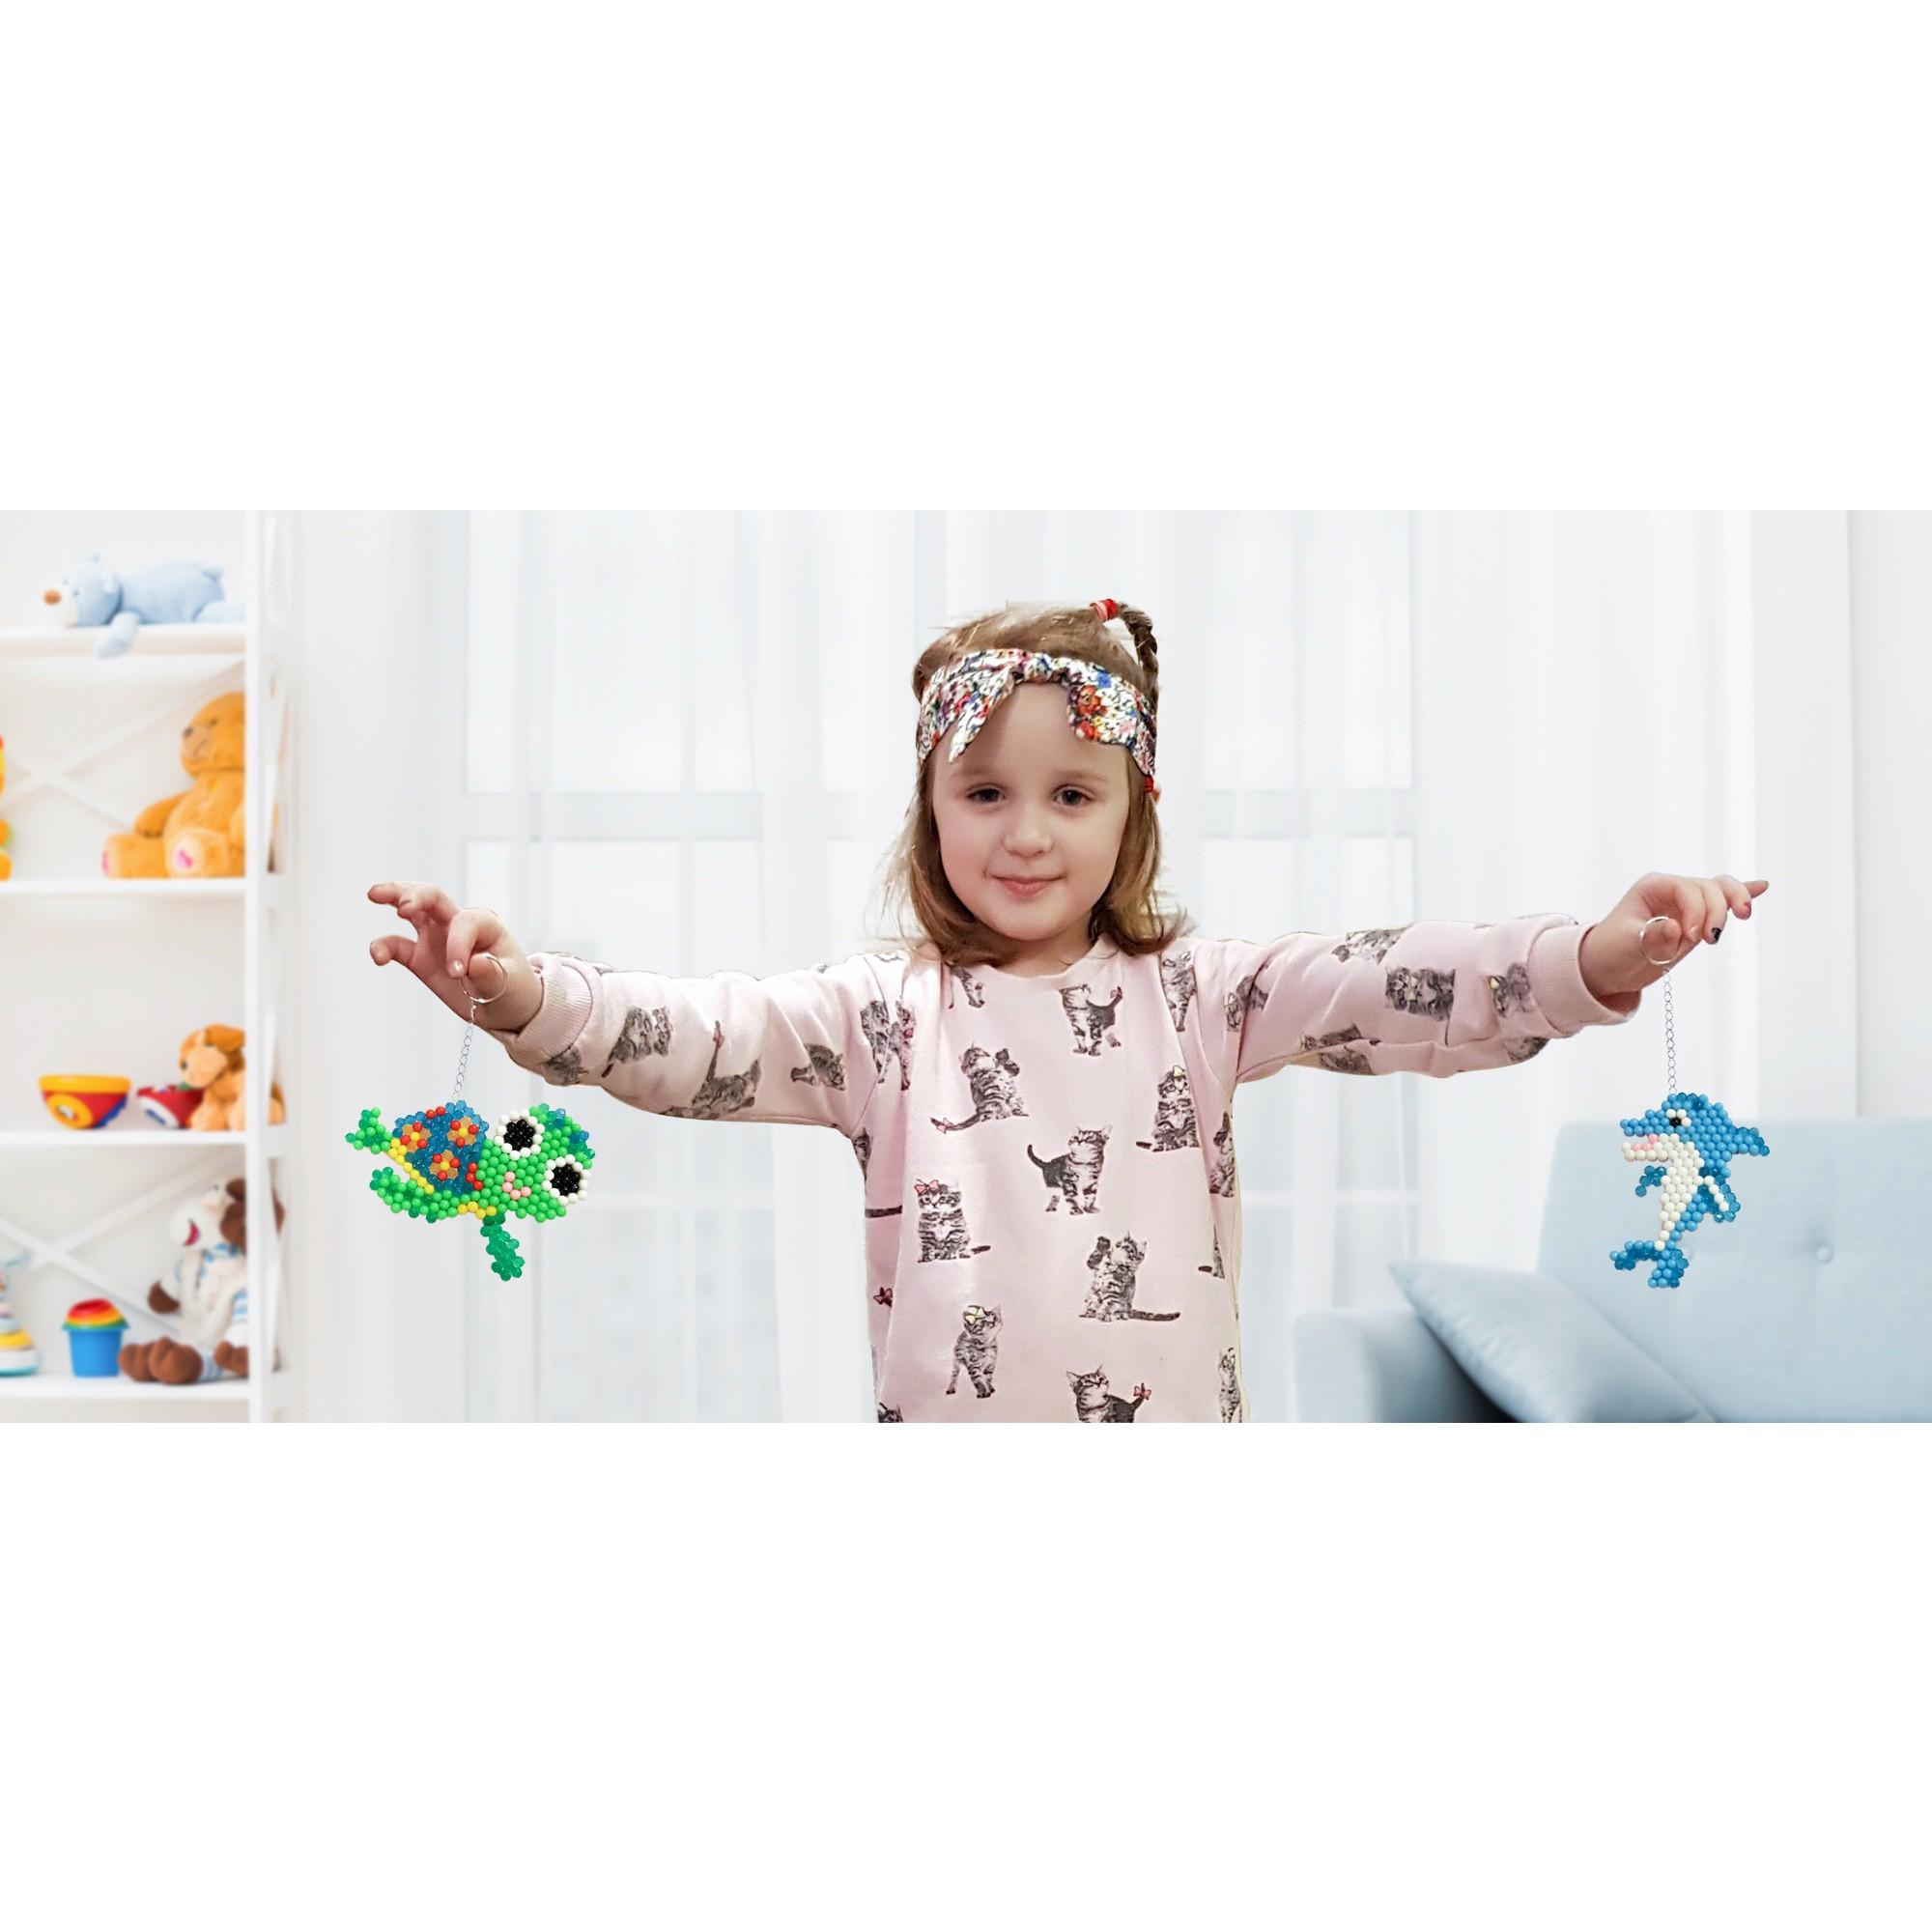 vodné korálky pre deti 2600ks šablóny pinzeta miska megamix.sk